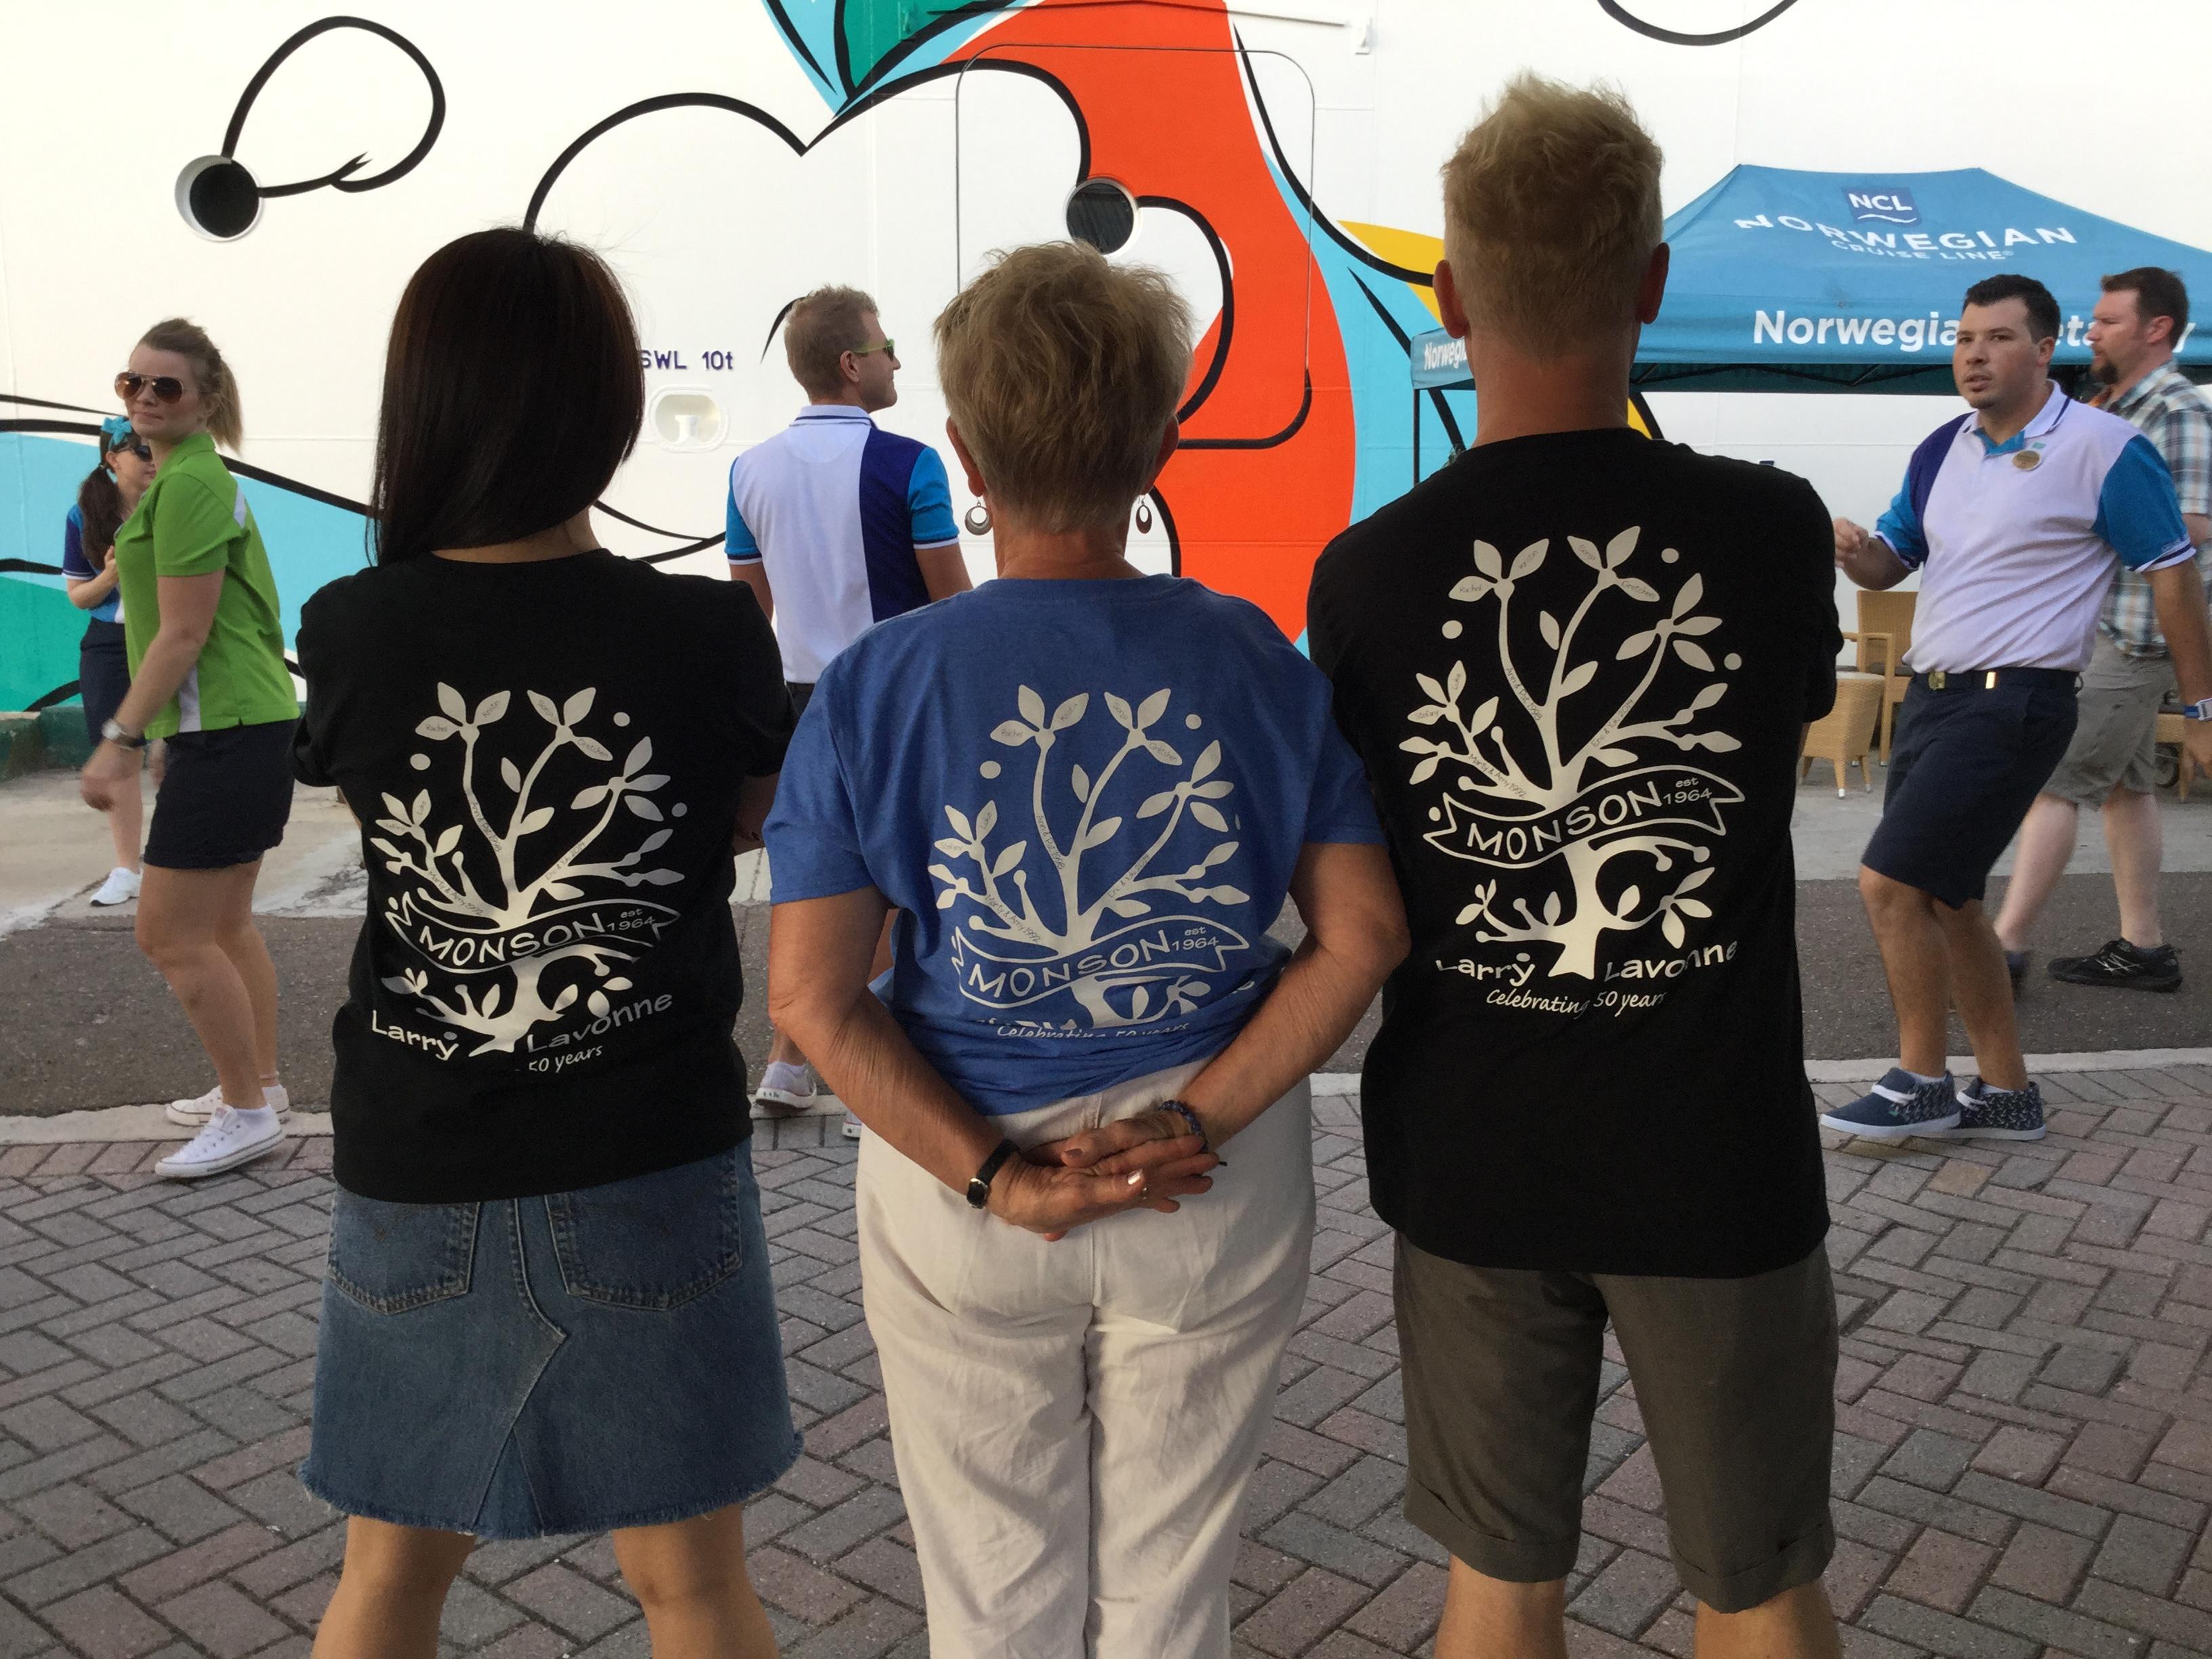 Custom T Shirts For The 50 Year Family Tree Shirt Design Ideas